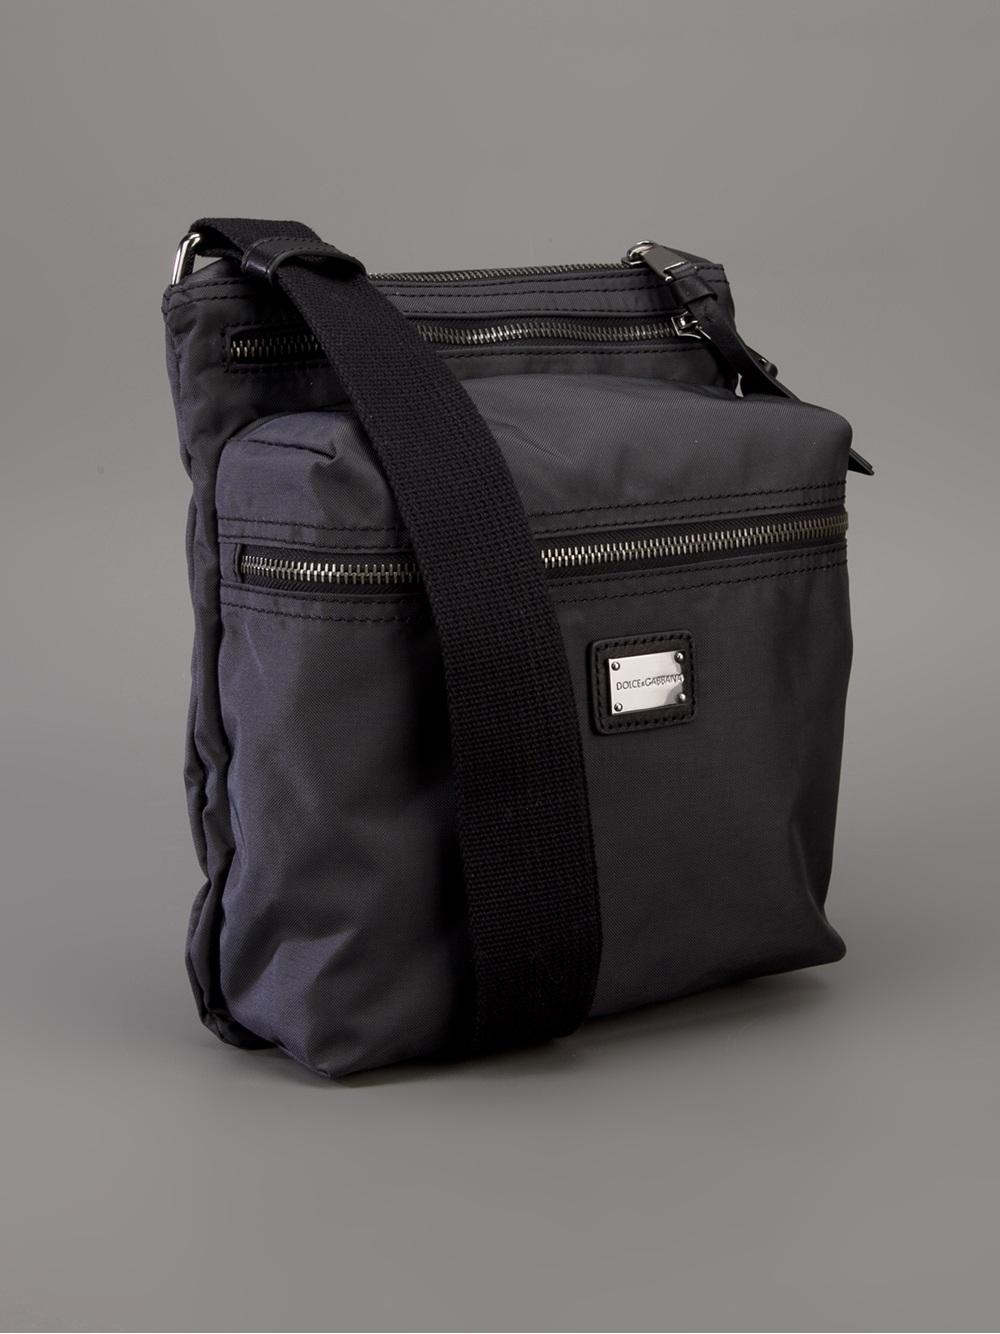 a2deb7087db9 Lyst - Dolce   Gabbana Shoulder Bag in Gray for Men